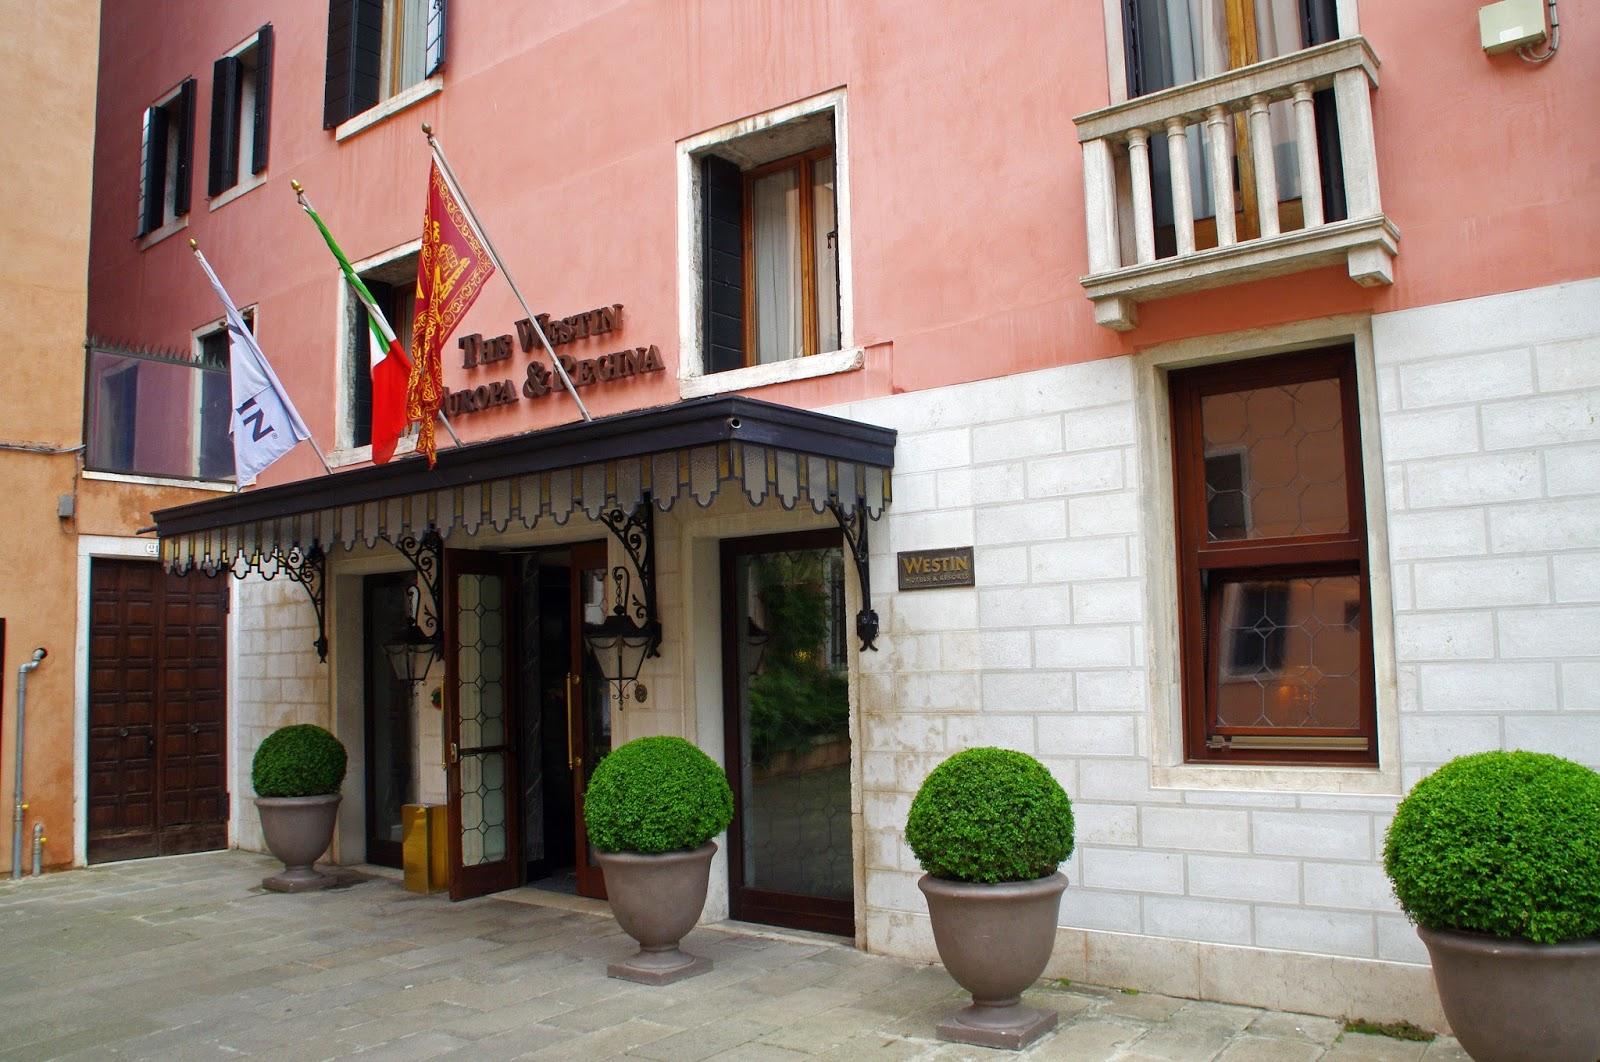 Entrance to Westin Europa & Regina Venice